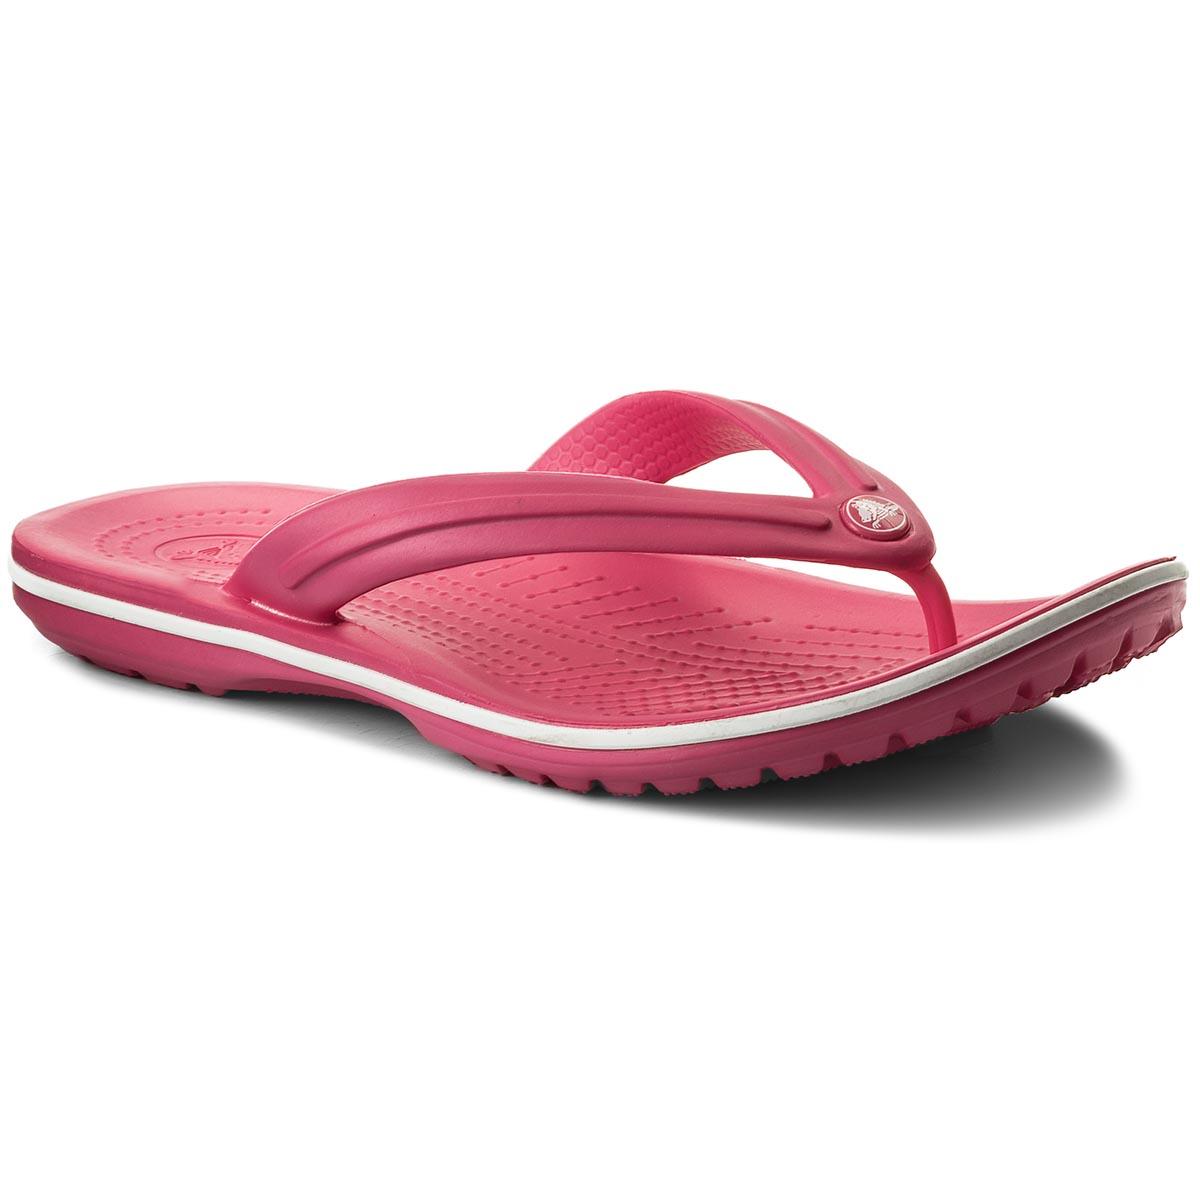 8271da1eff587 Žabky CROCS - Crocband Flip 11033 Paradise Pink/White - Glami.sk